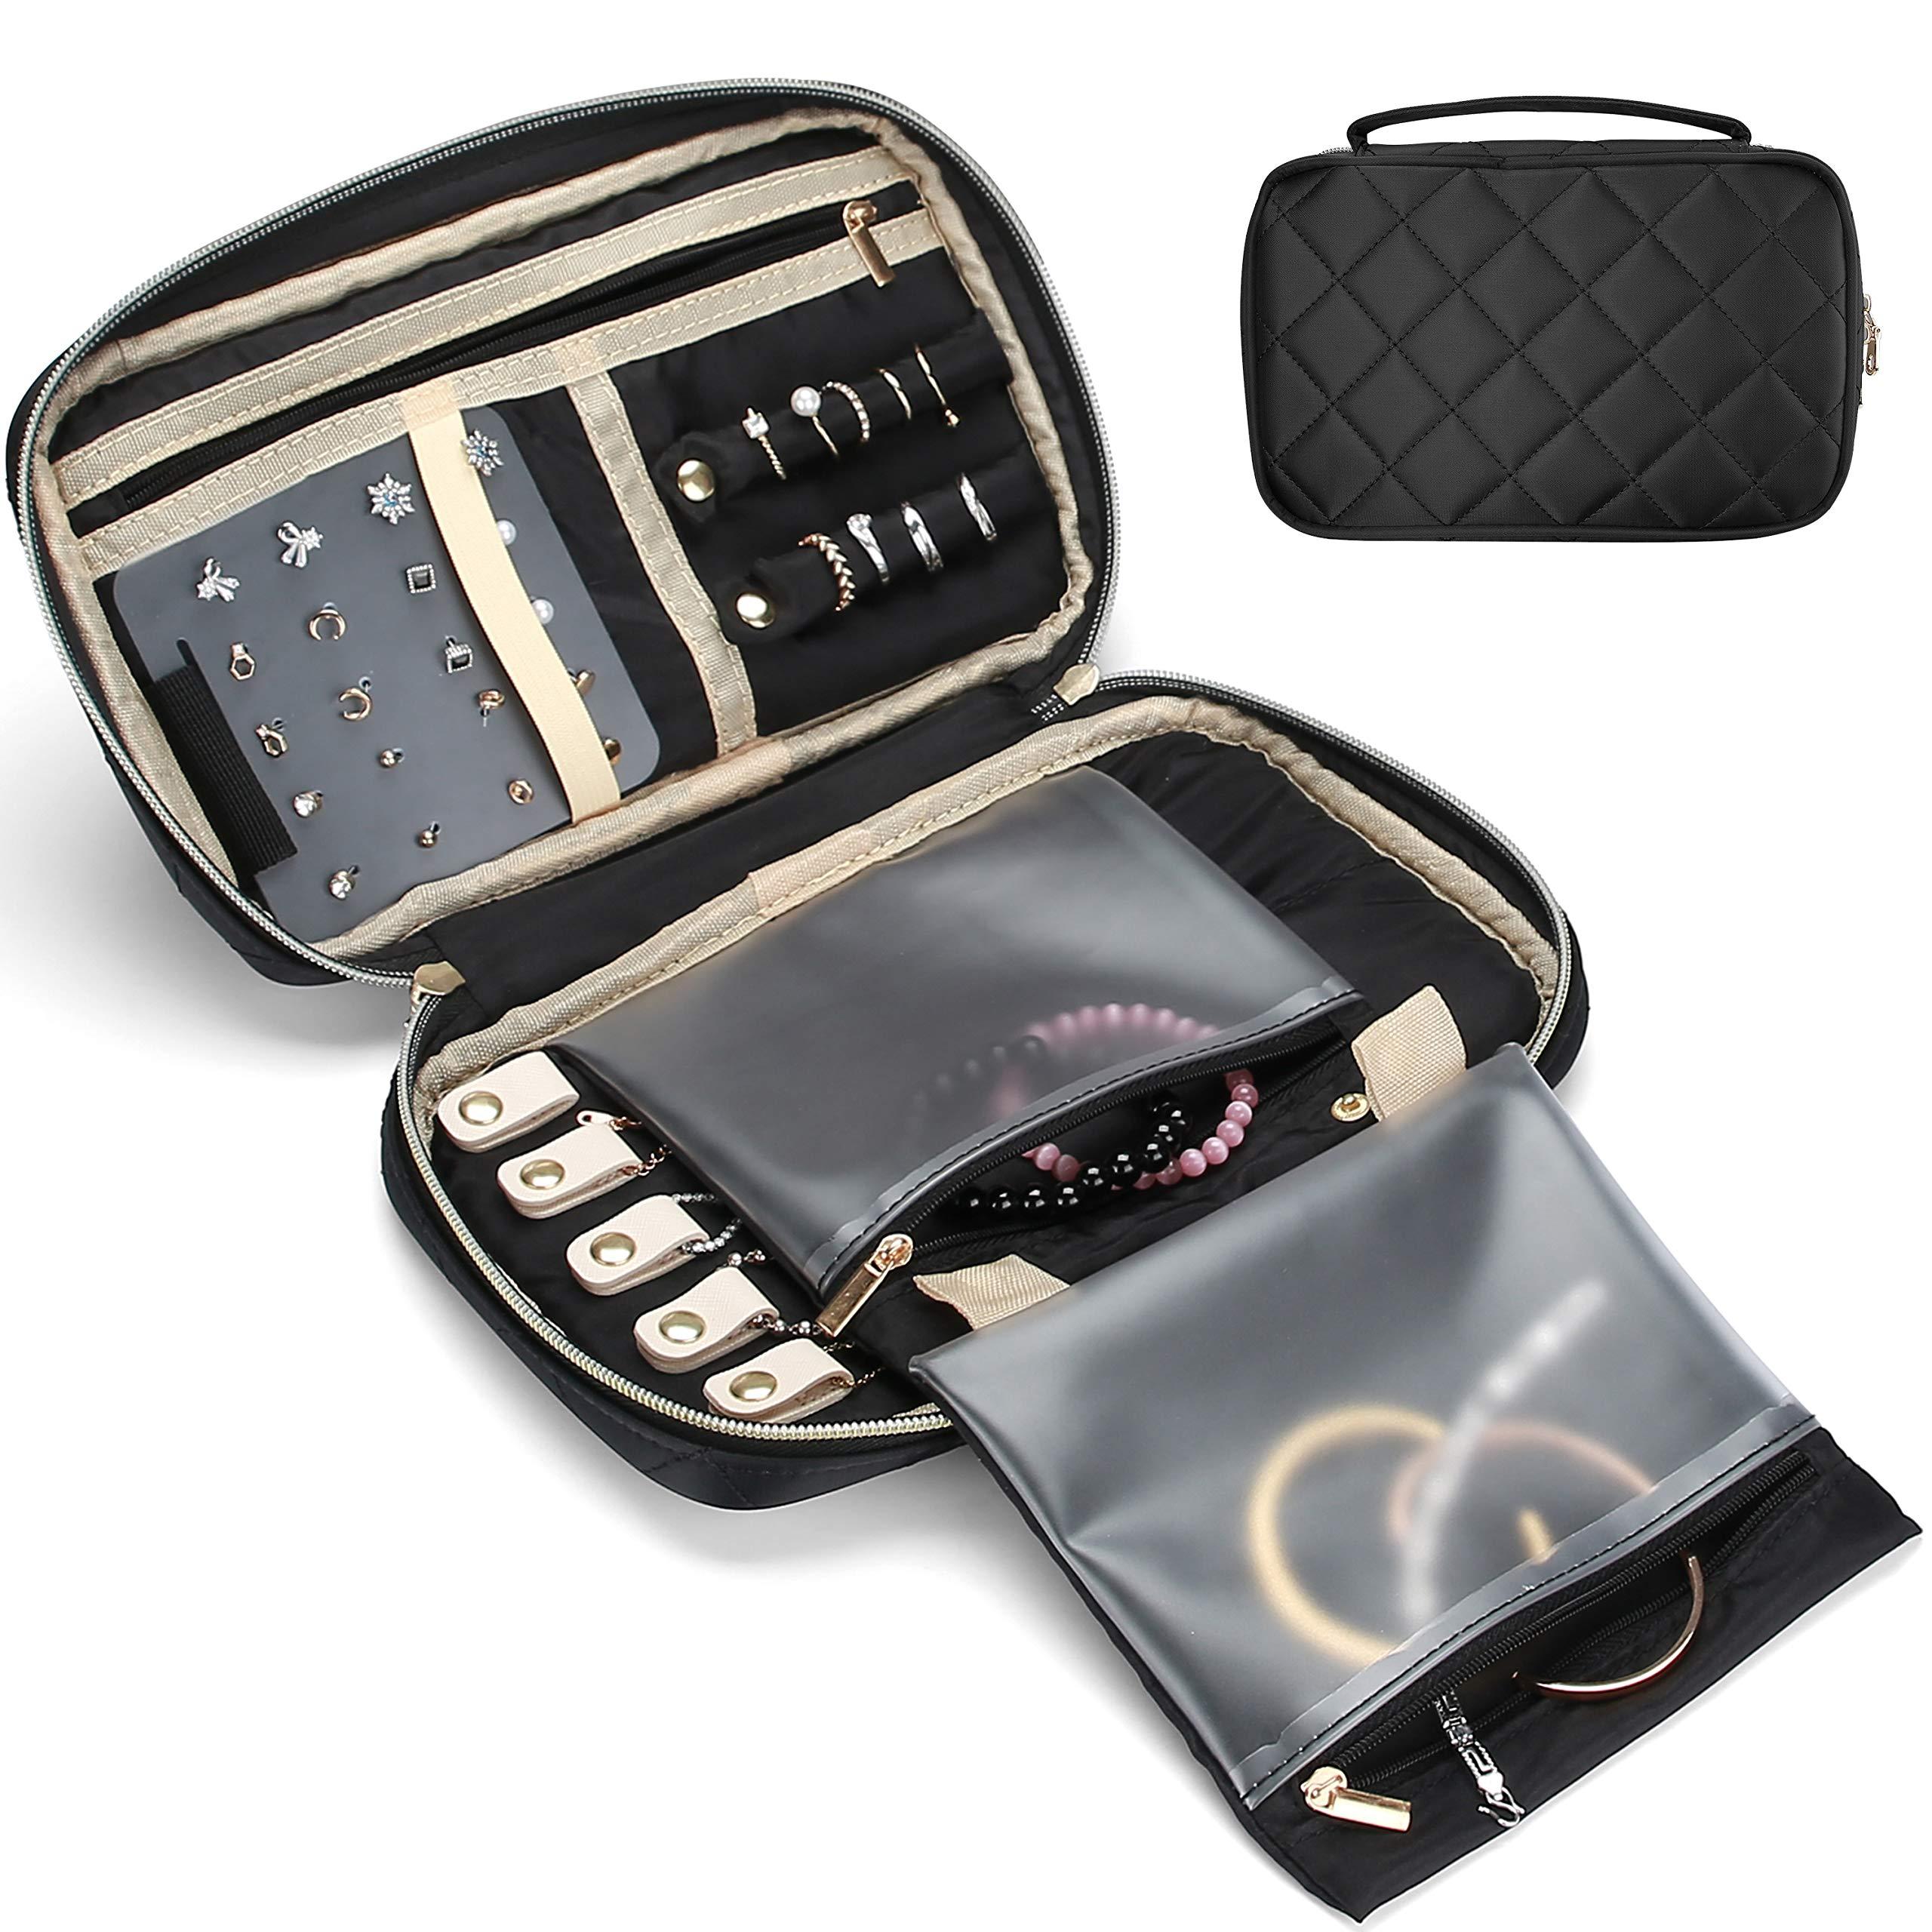 ProCase 旅行珠宝收纳盒,软垫珠宝旅行收纳袋盒适用于戒指、手链、耳环、链条、项链夹女士女孩-黑色